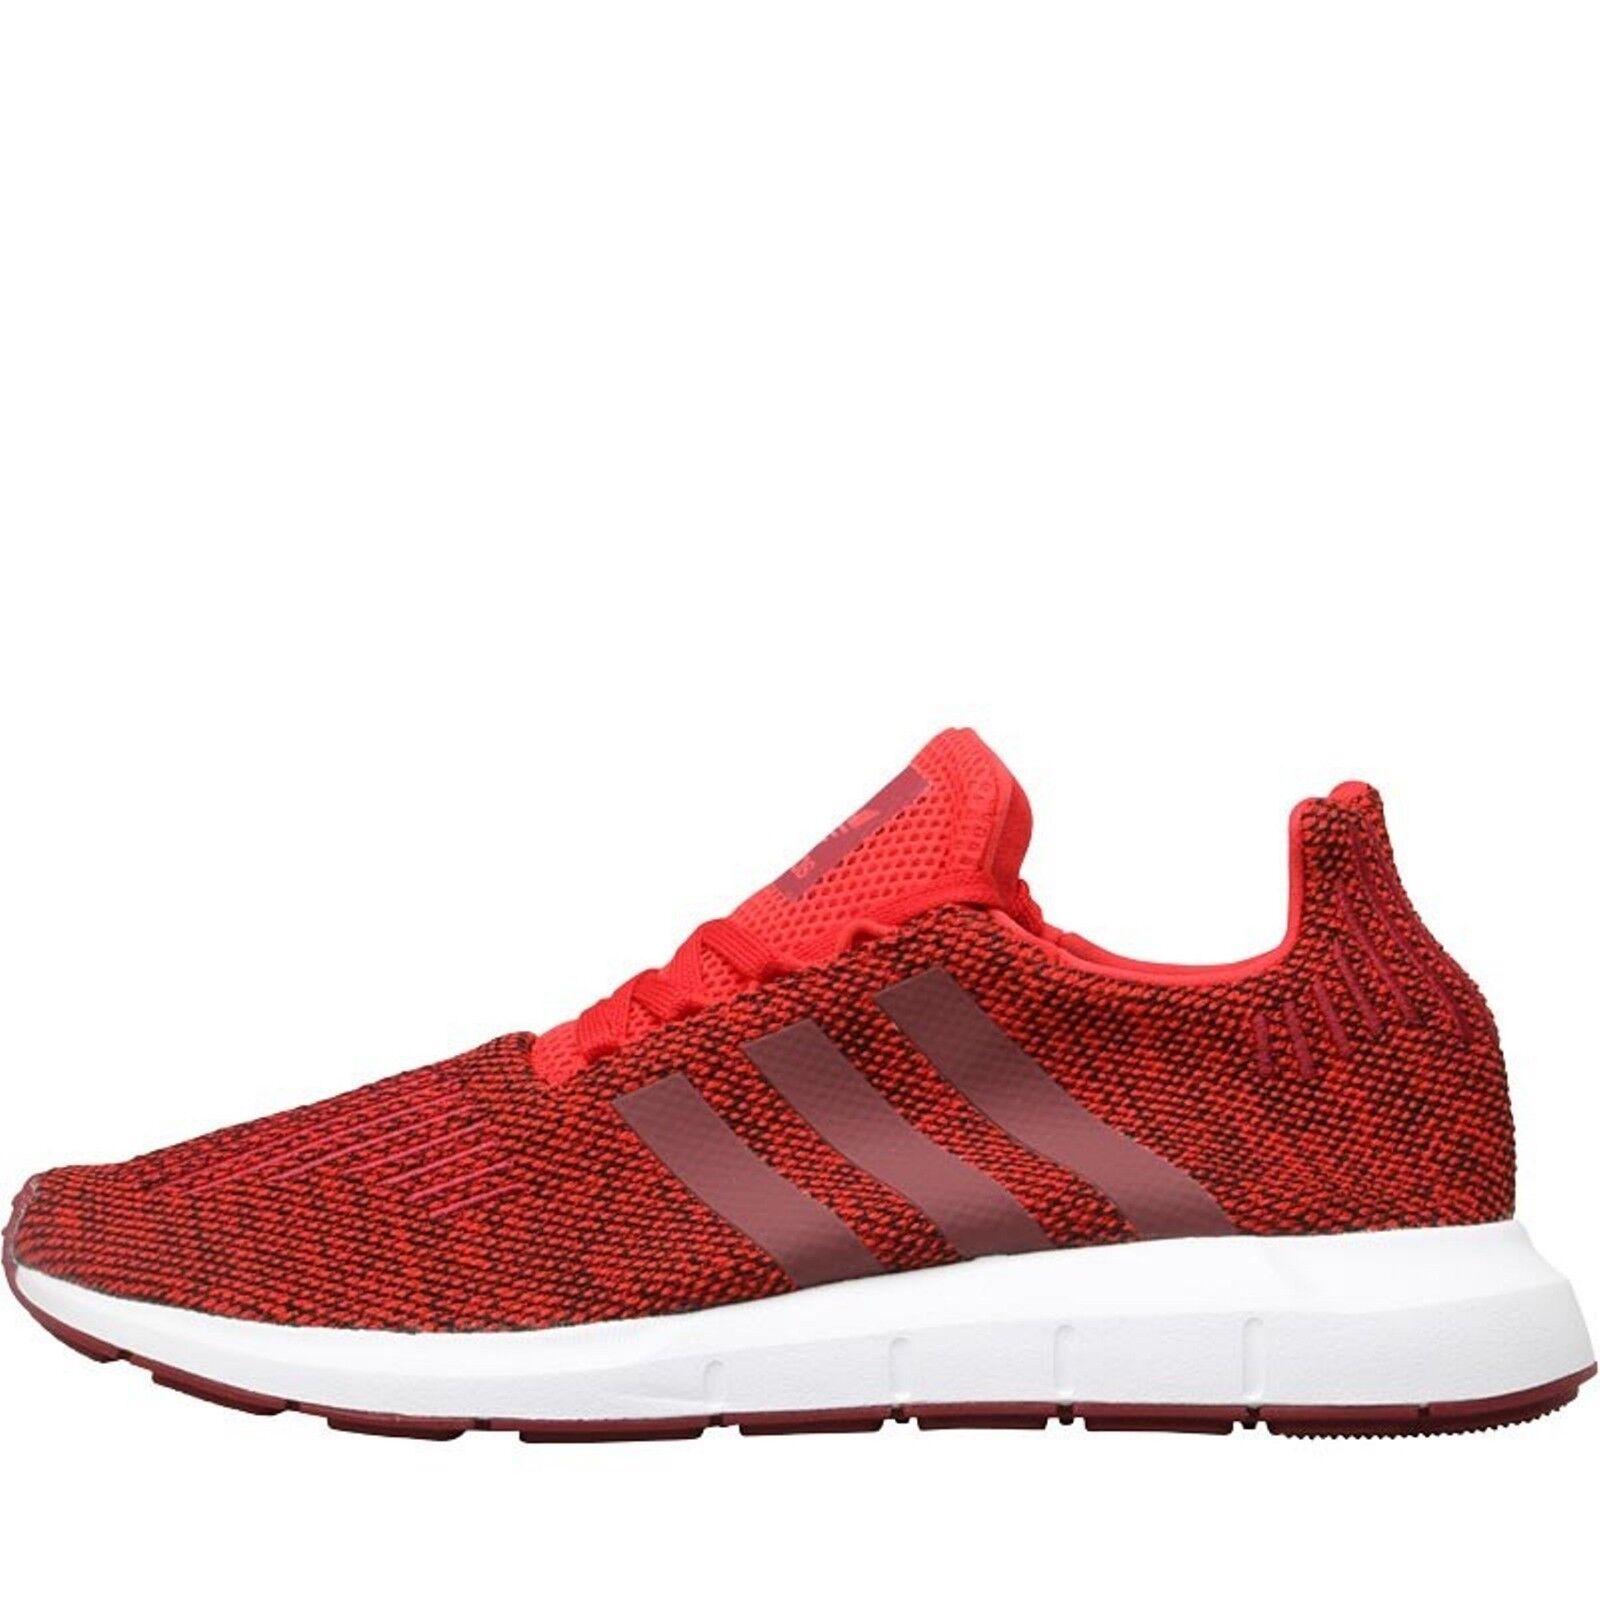 Adidas Originals Mens Swift Run Trainers    - Größe UK 9.5 ed0e98